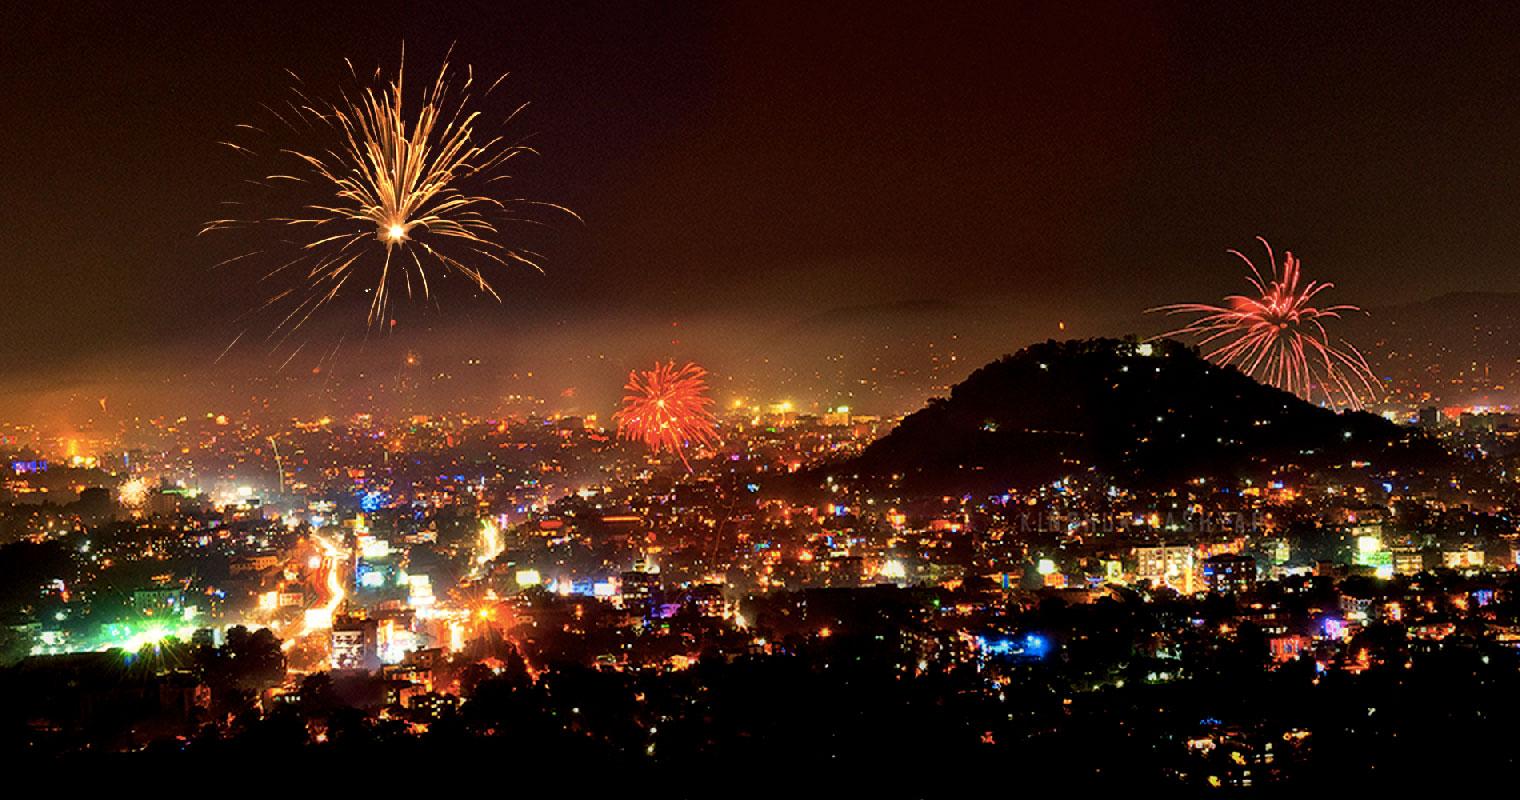 Diwali festival about 100 years ago in rural Gujarat as described by Ravi Shankar Maharaj